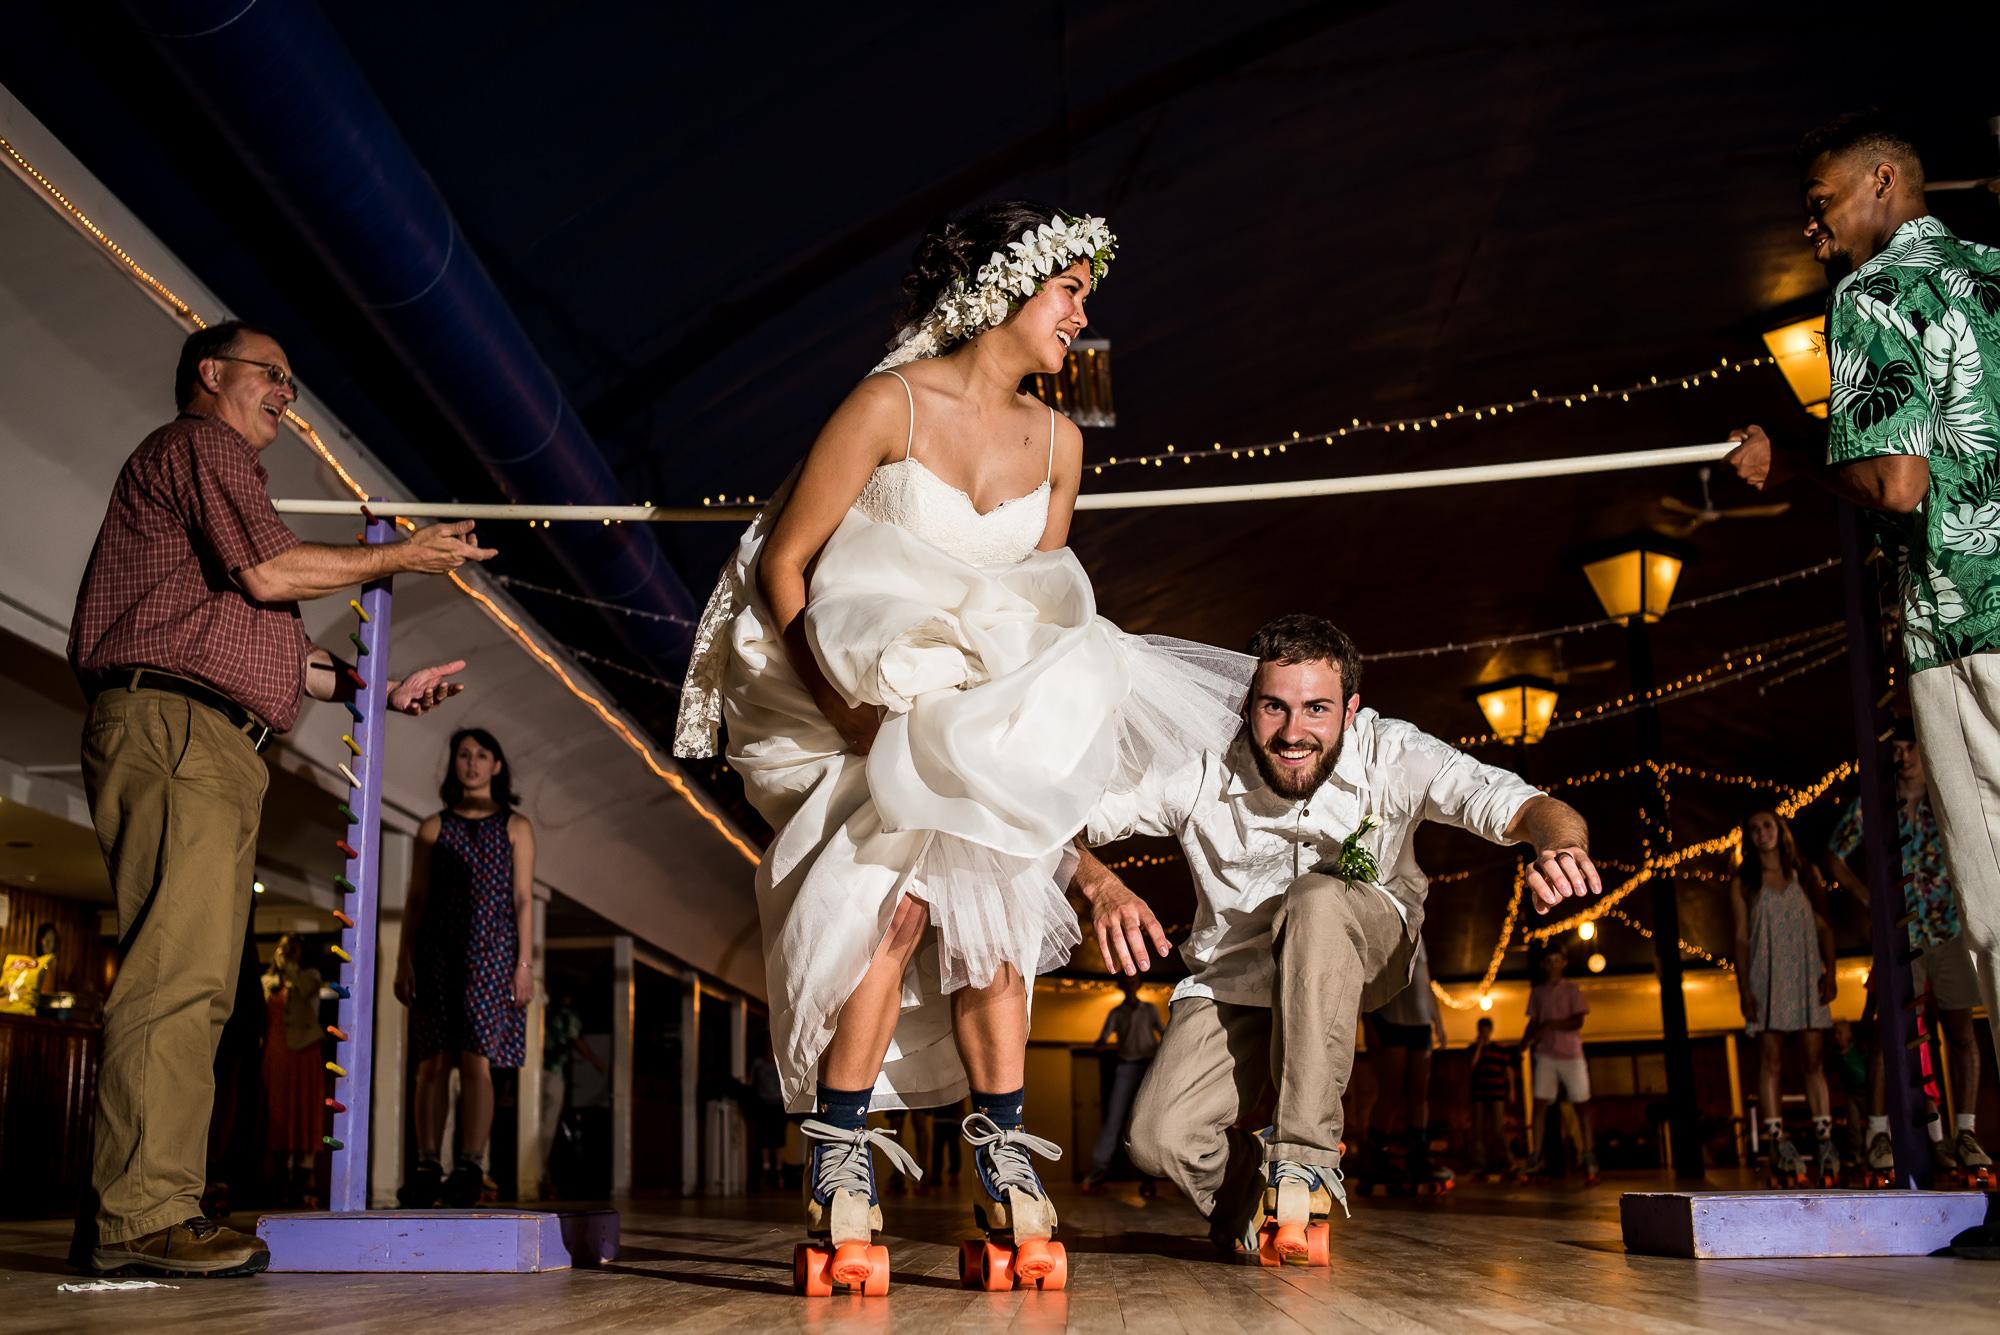 WEDDING-PHOTOGRAPHERS-IN-IOWA-0038.jpg